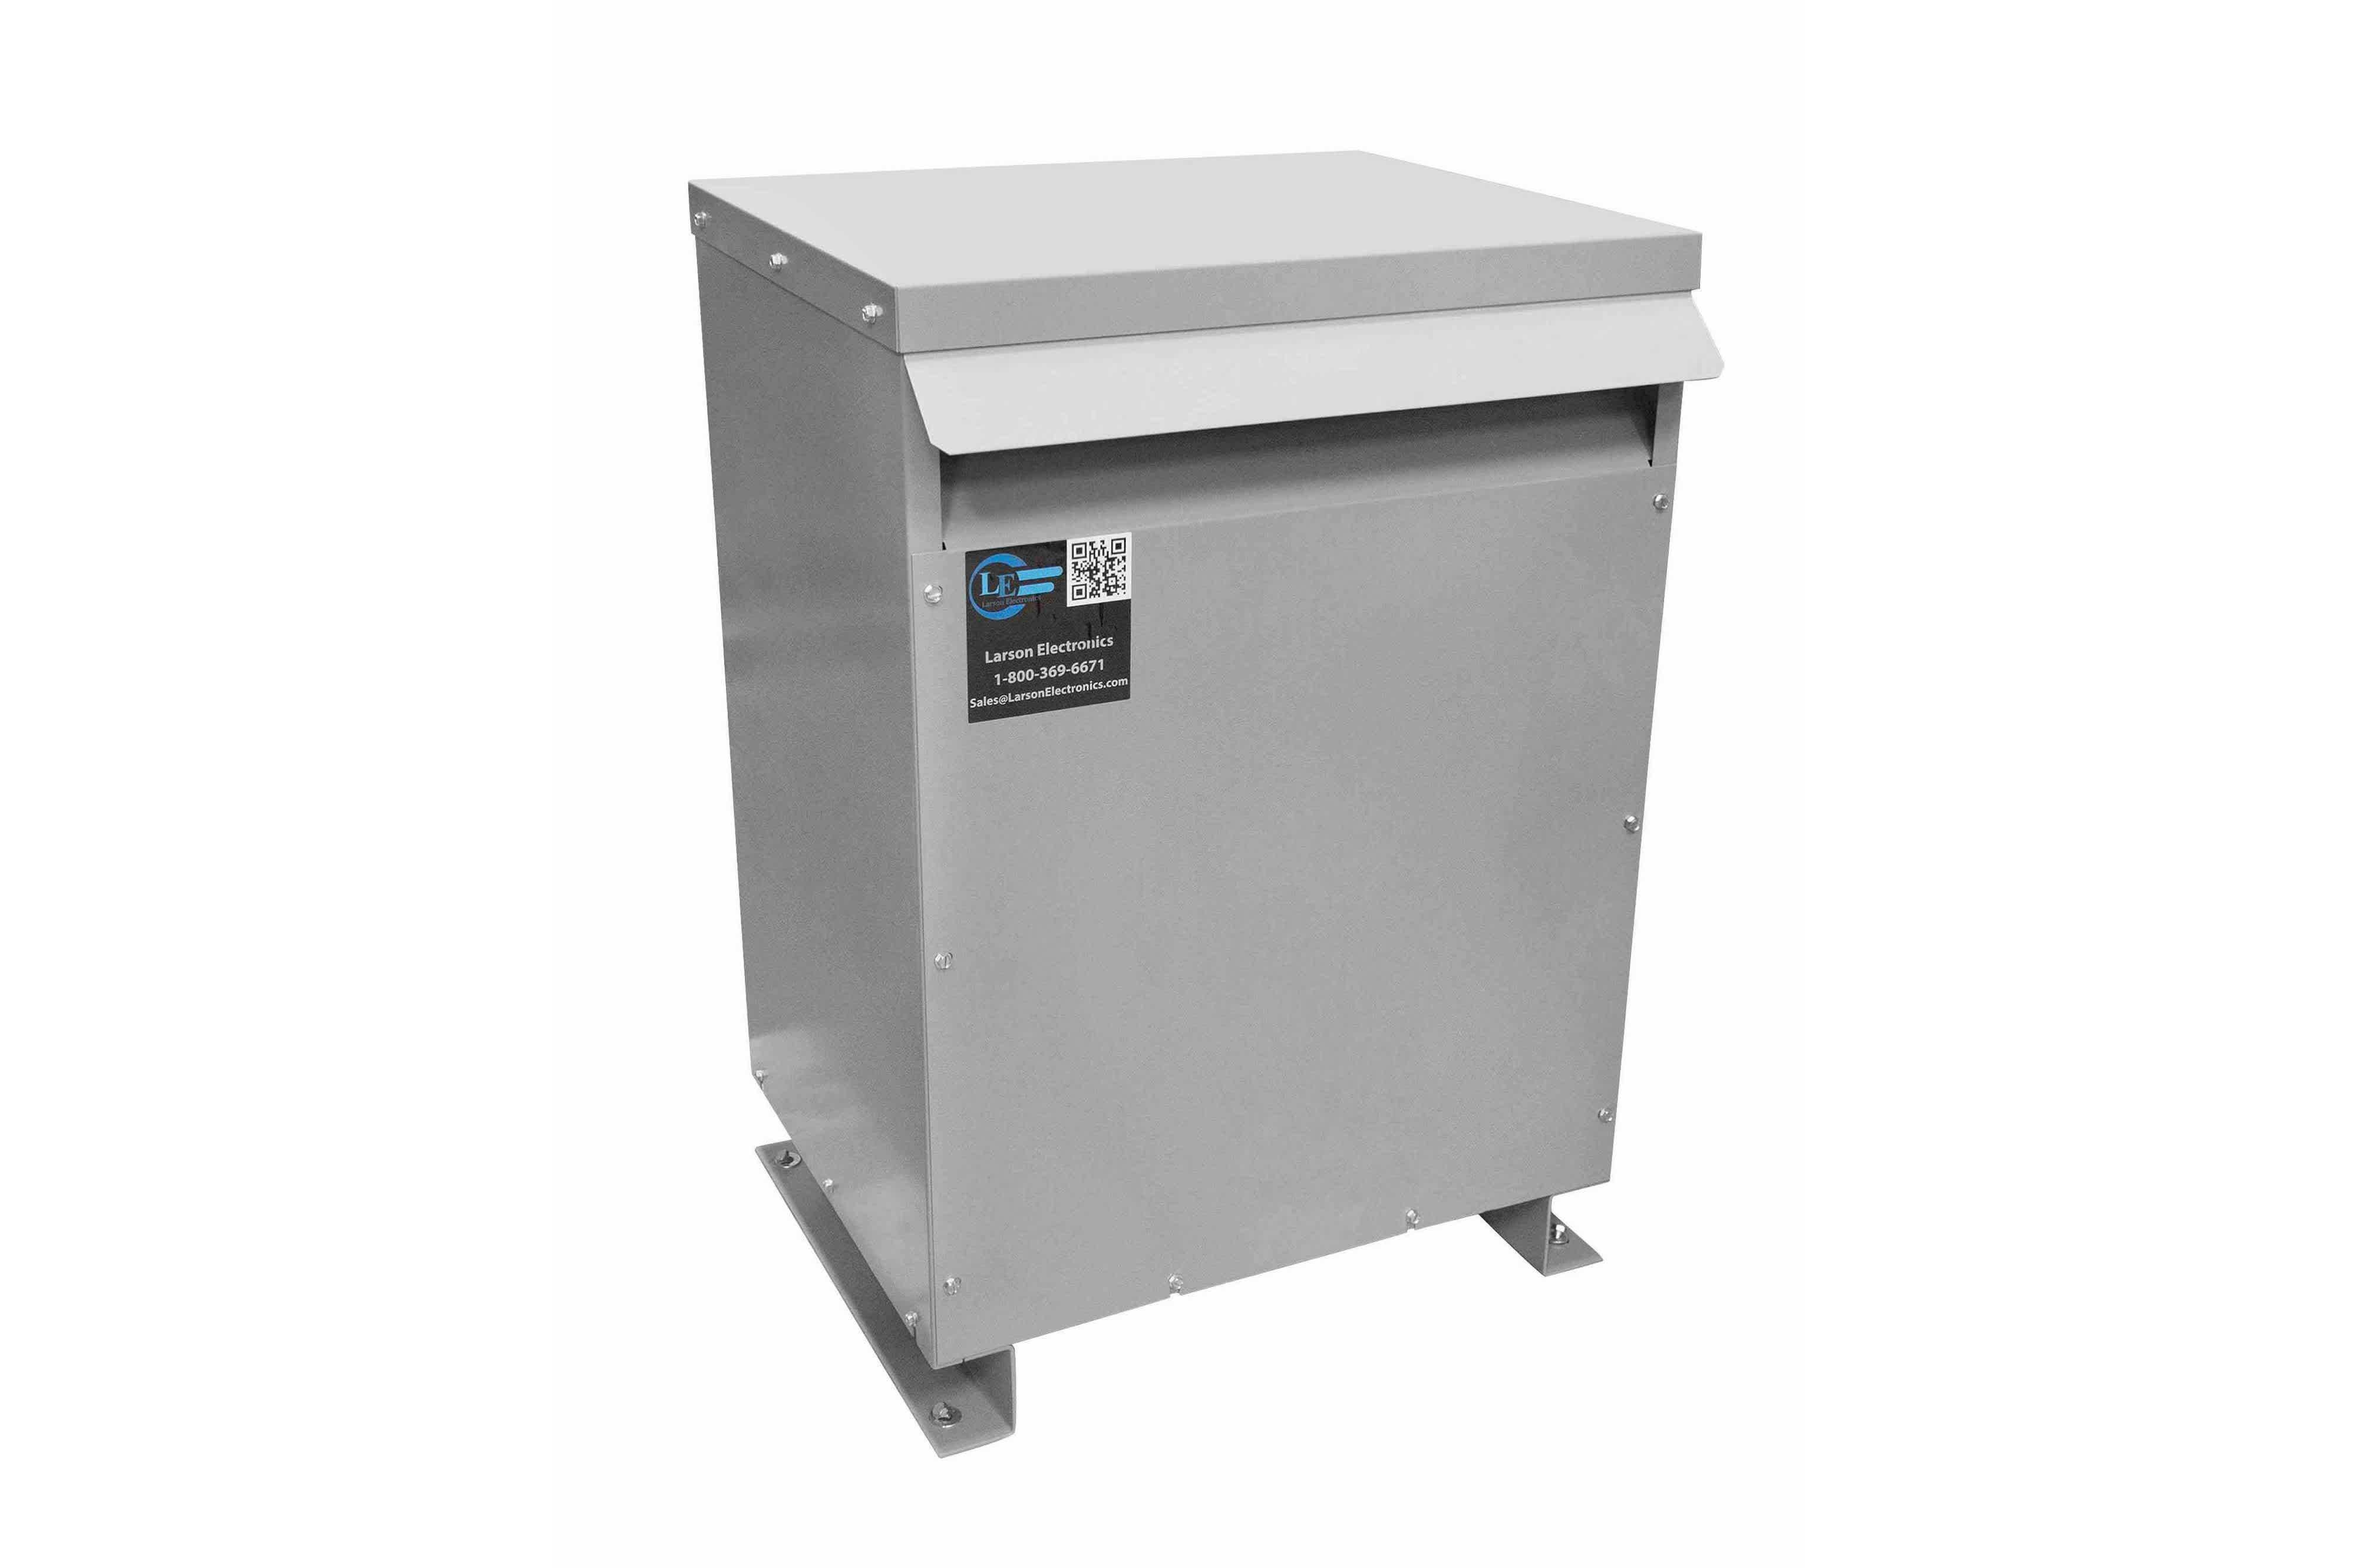 125 kVA 3PH Isolation Transformer, 600V Wye Primary, 480Y/277 Wye-N Secondary, N3R, Ventilated, 60 Hz